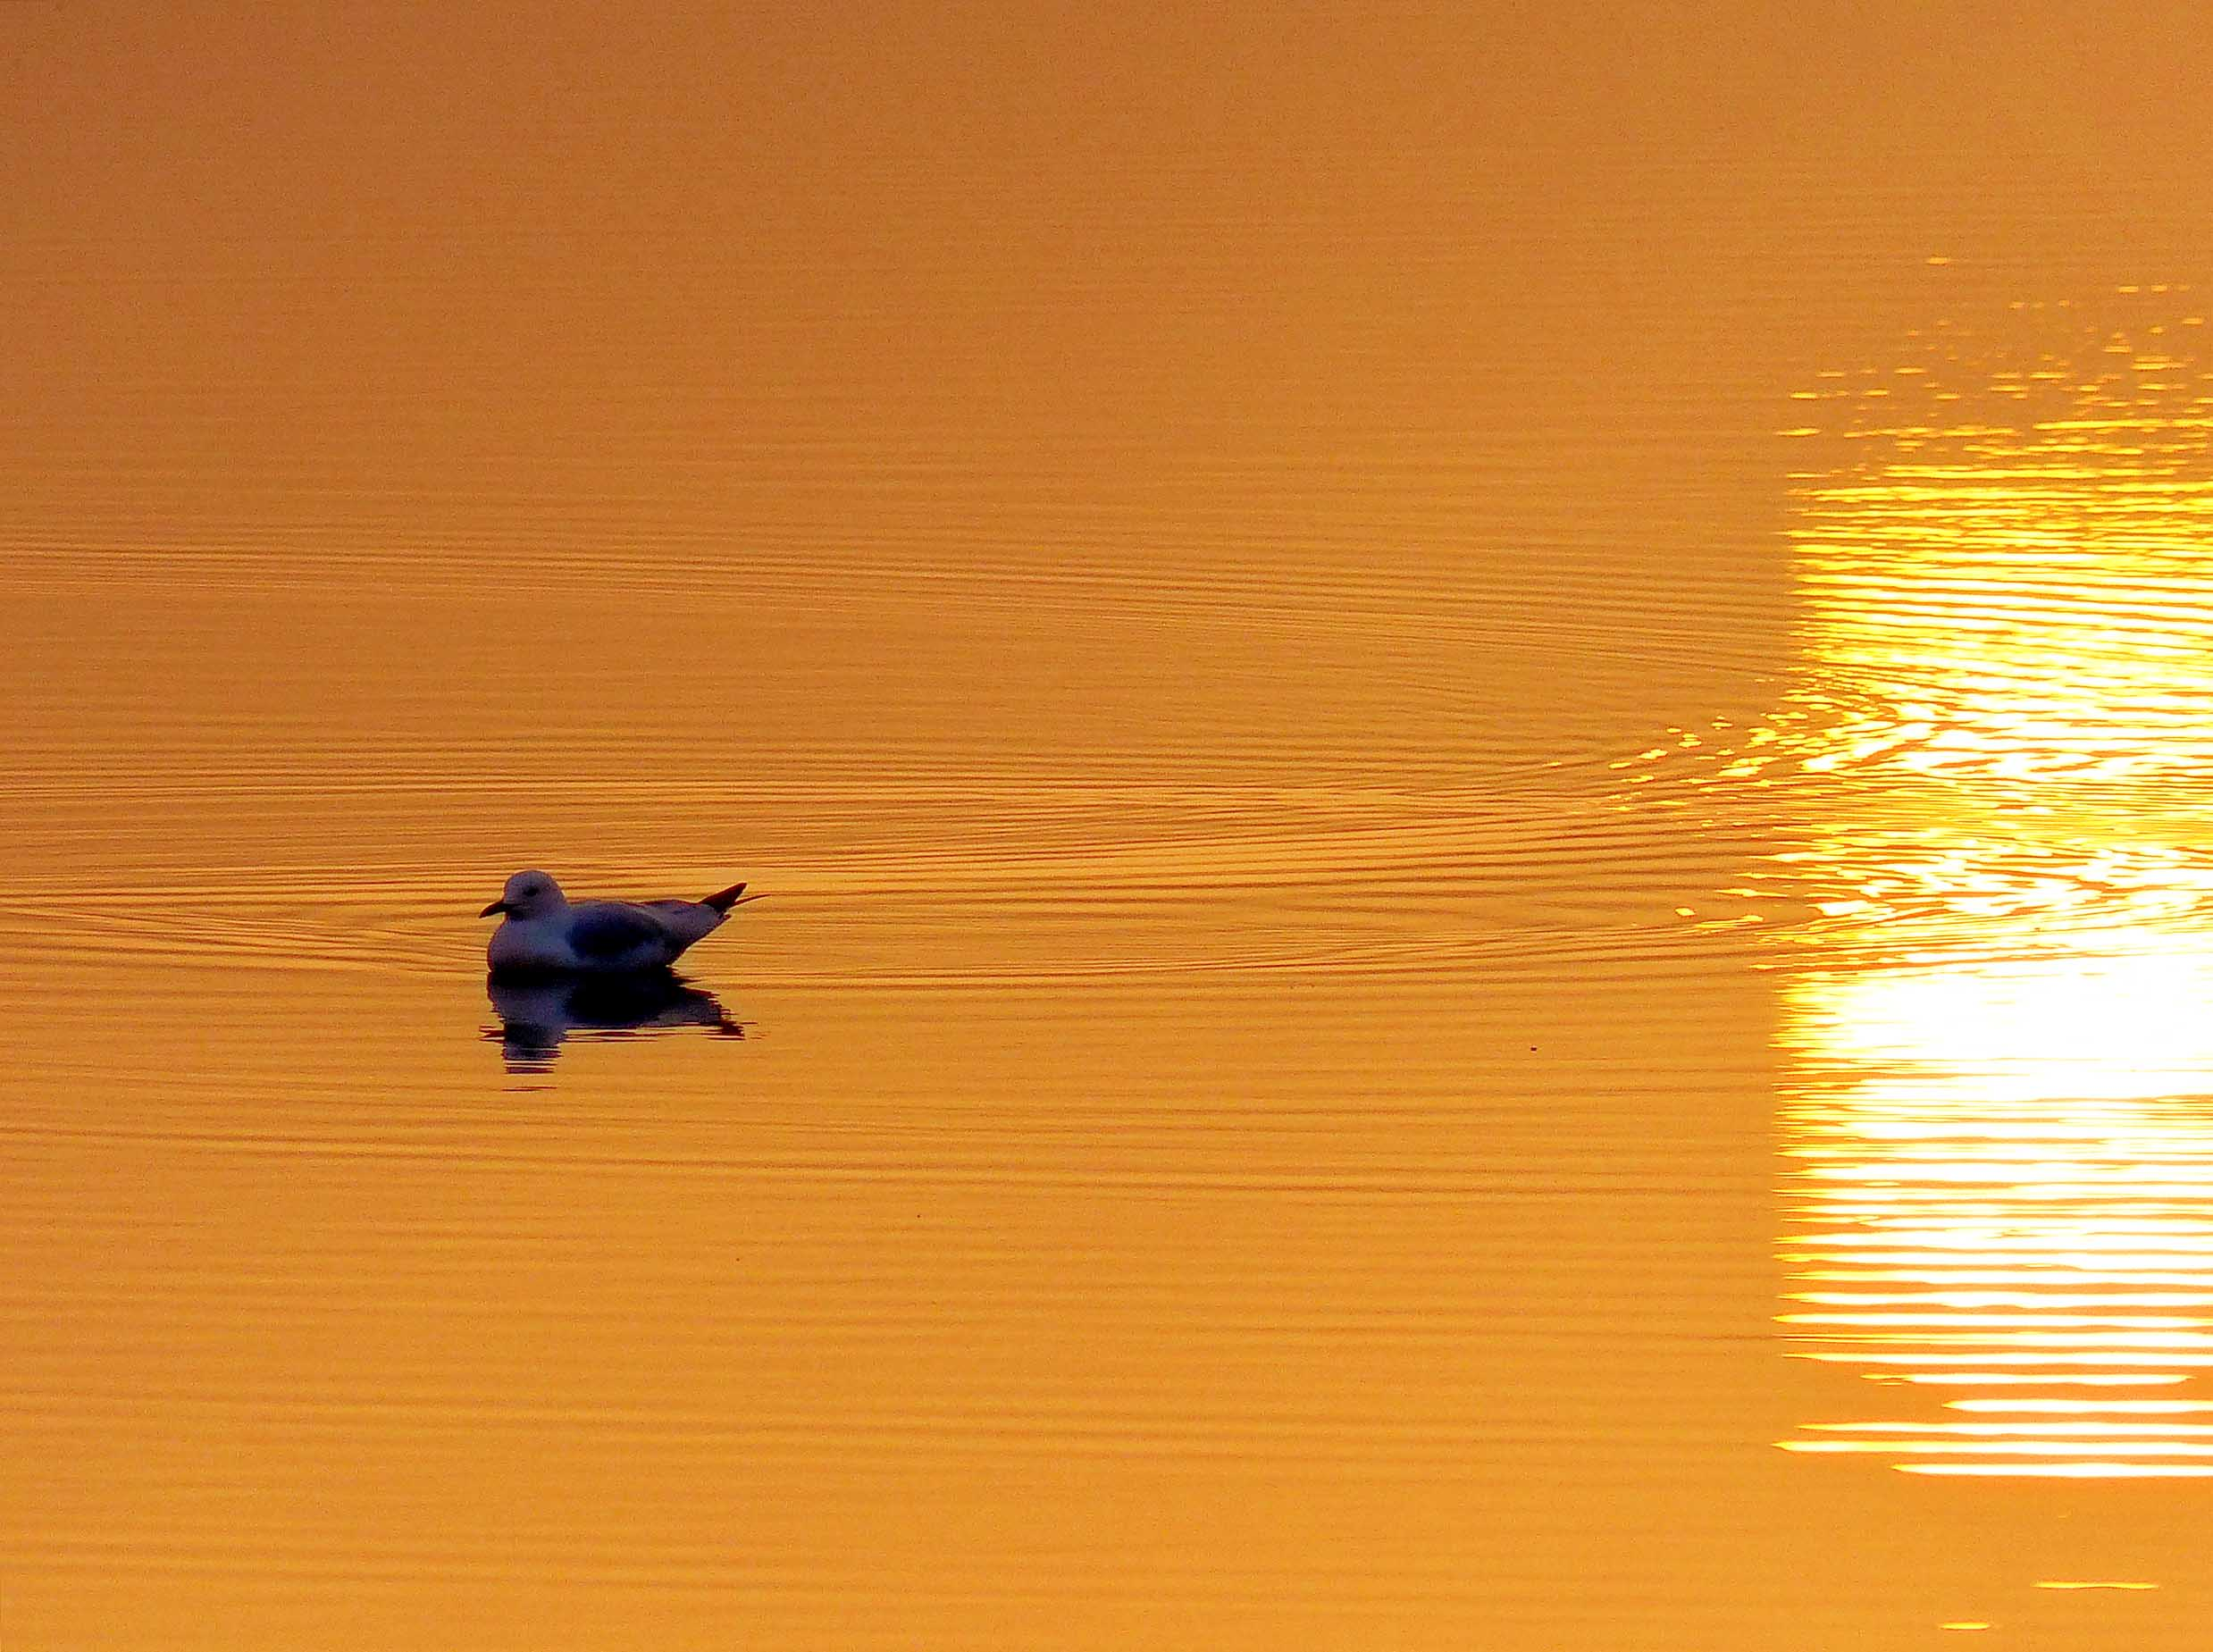 Seagull floating on orange water